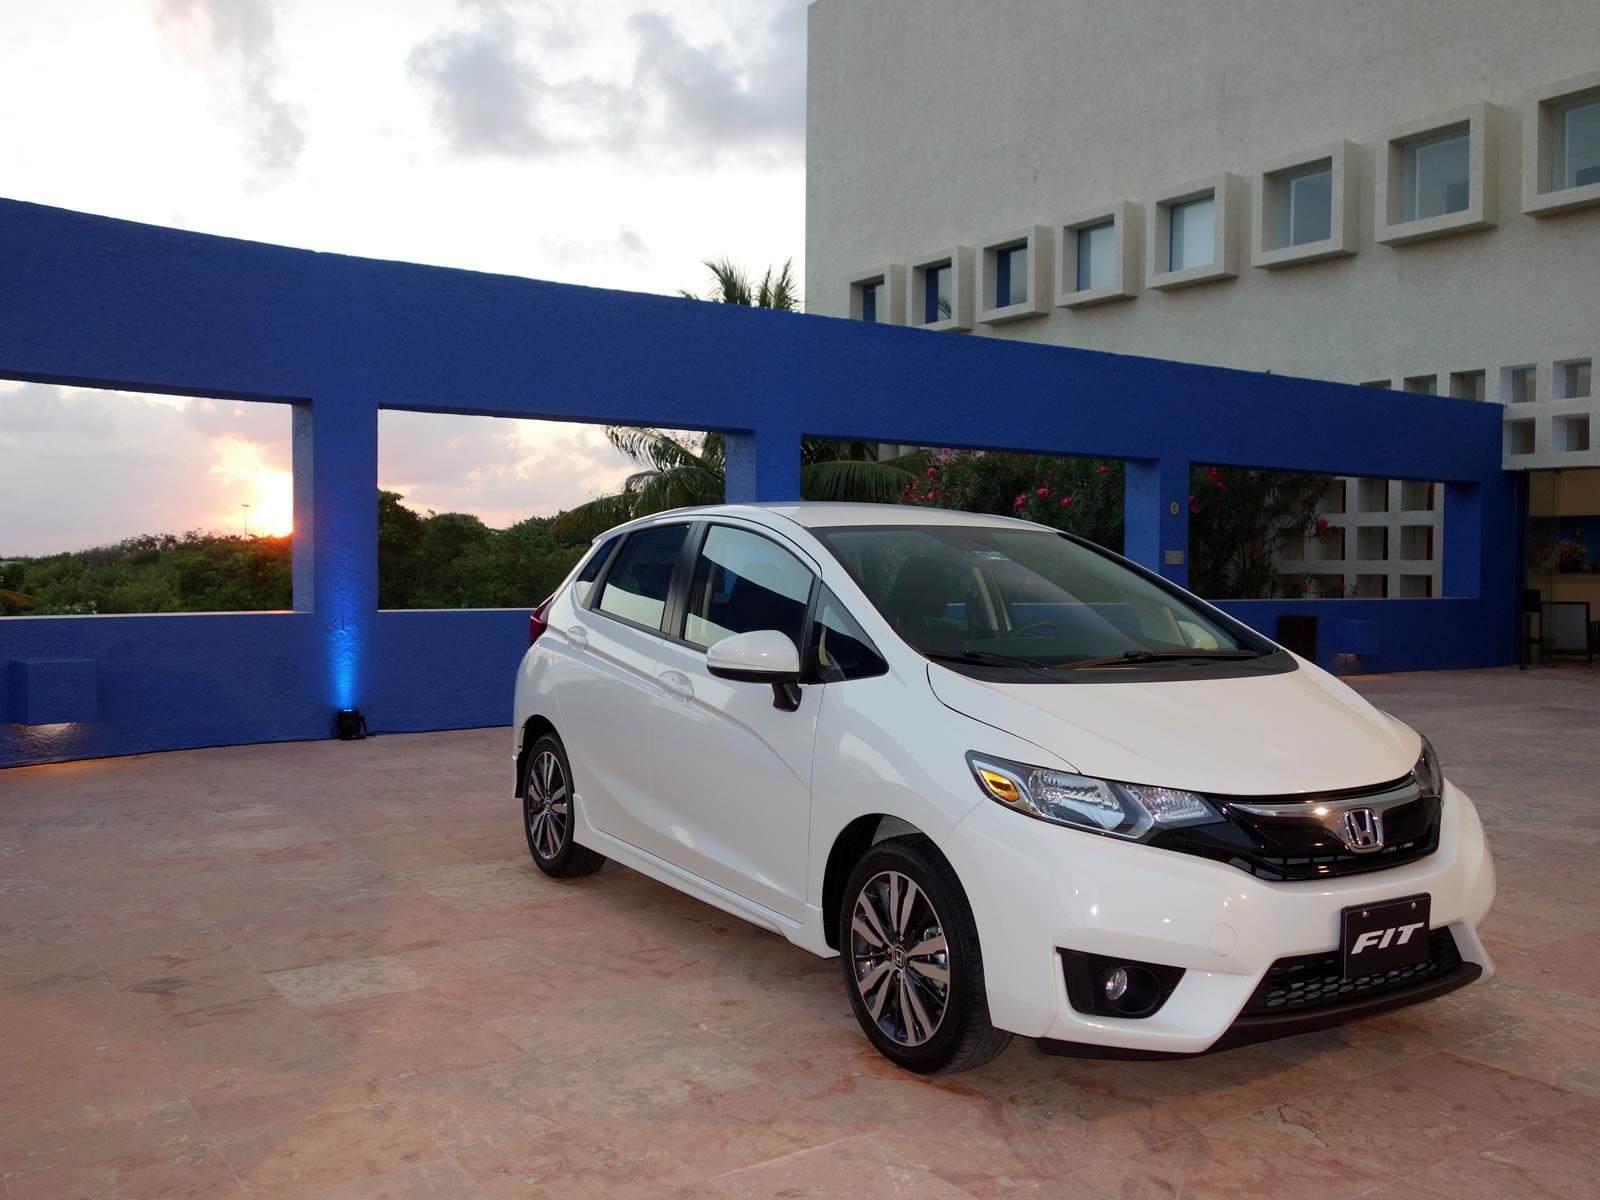 Honda fit 2015 a prueba for Honda fit 2017 precio